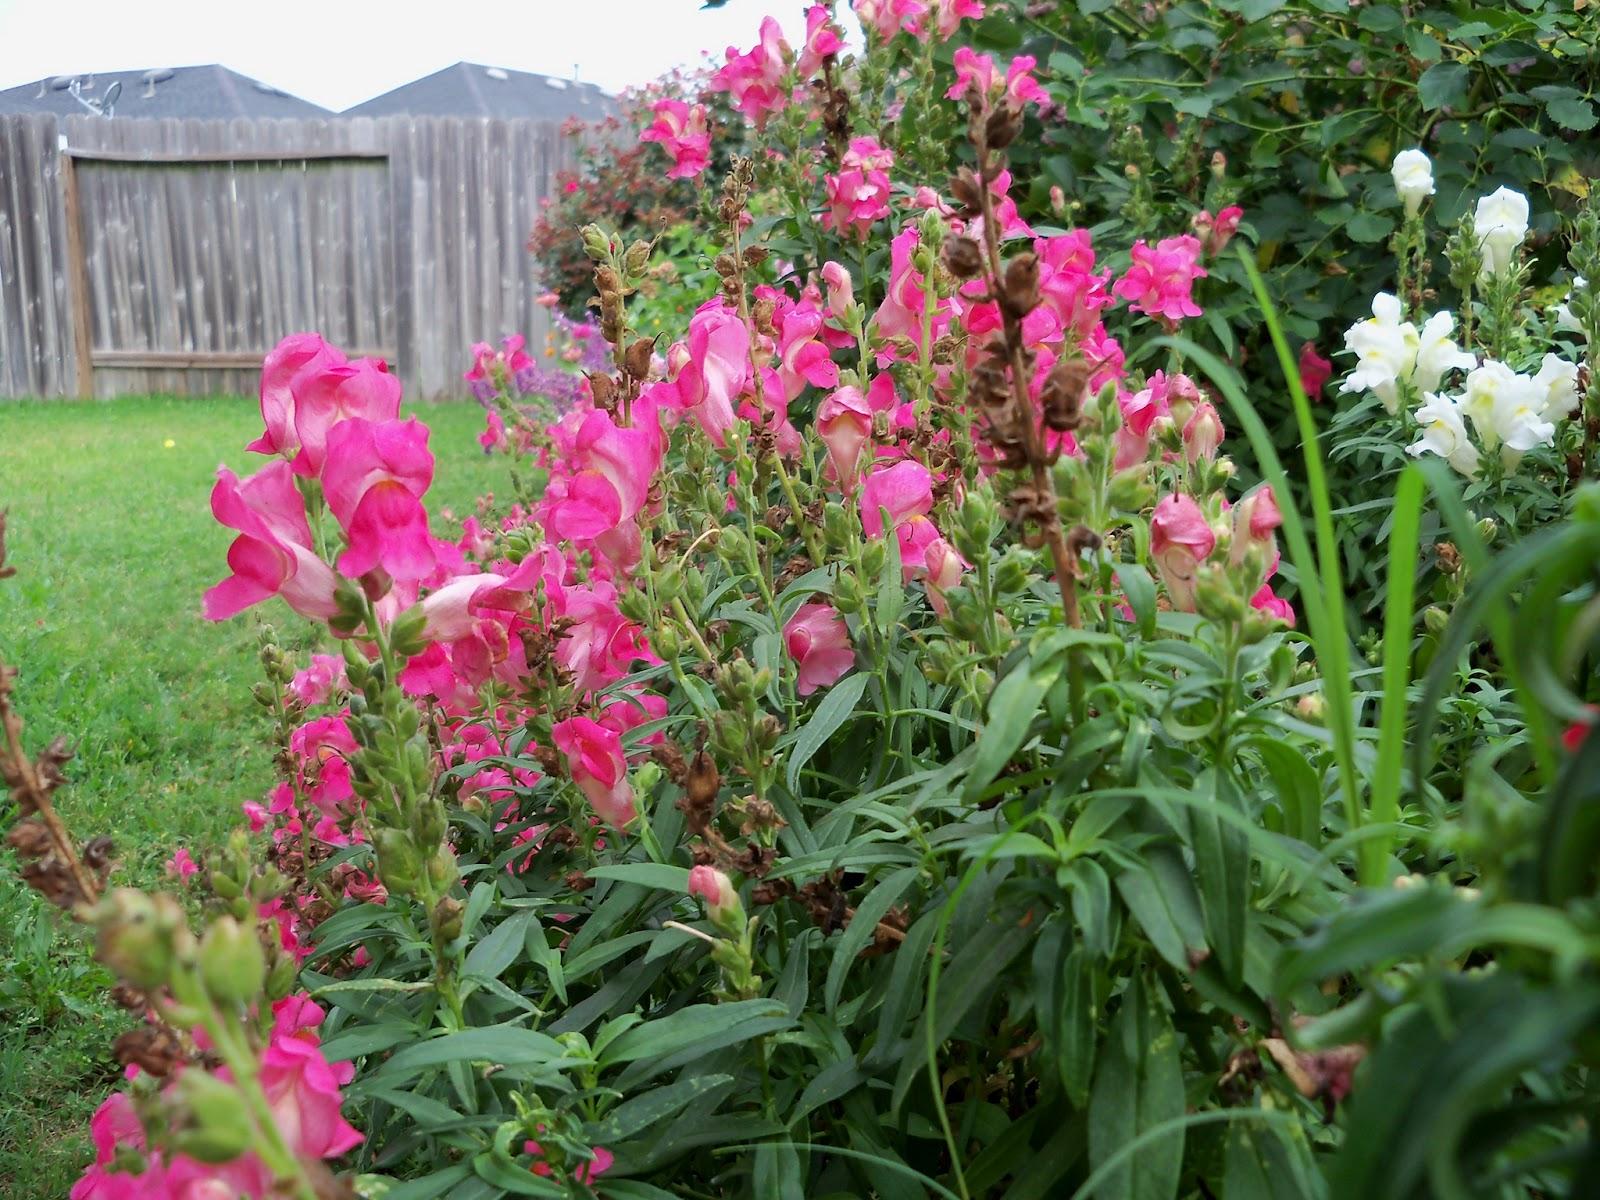 Gardening 2012 - 115_2005.JPG